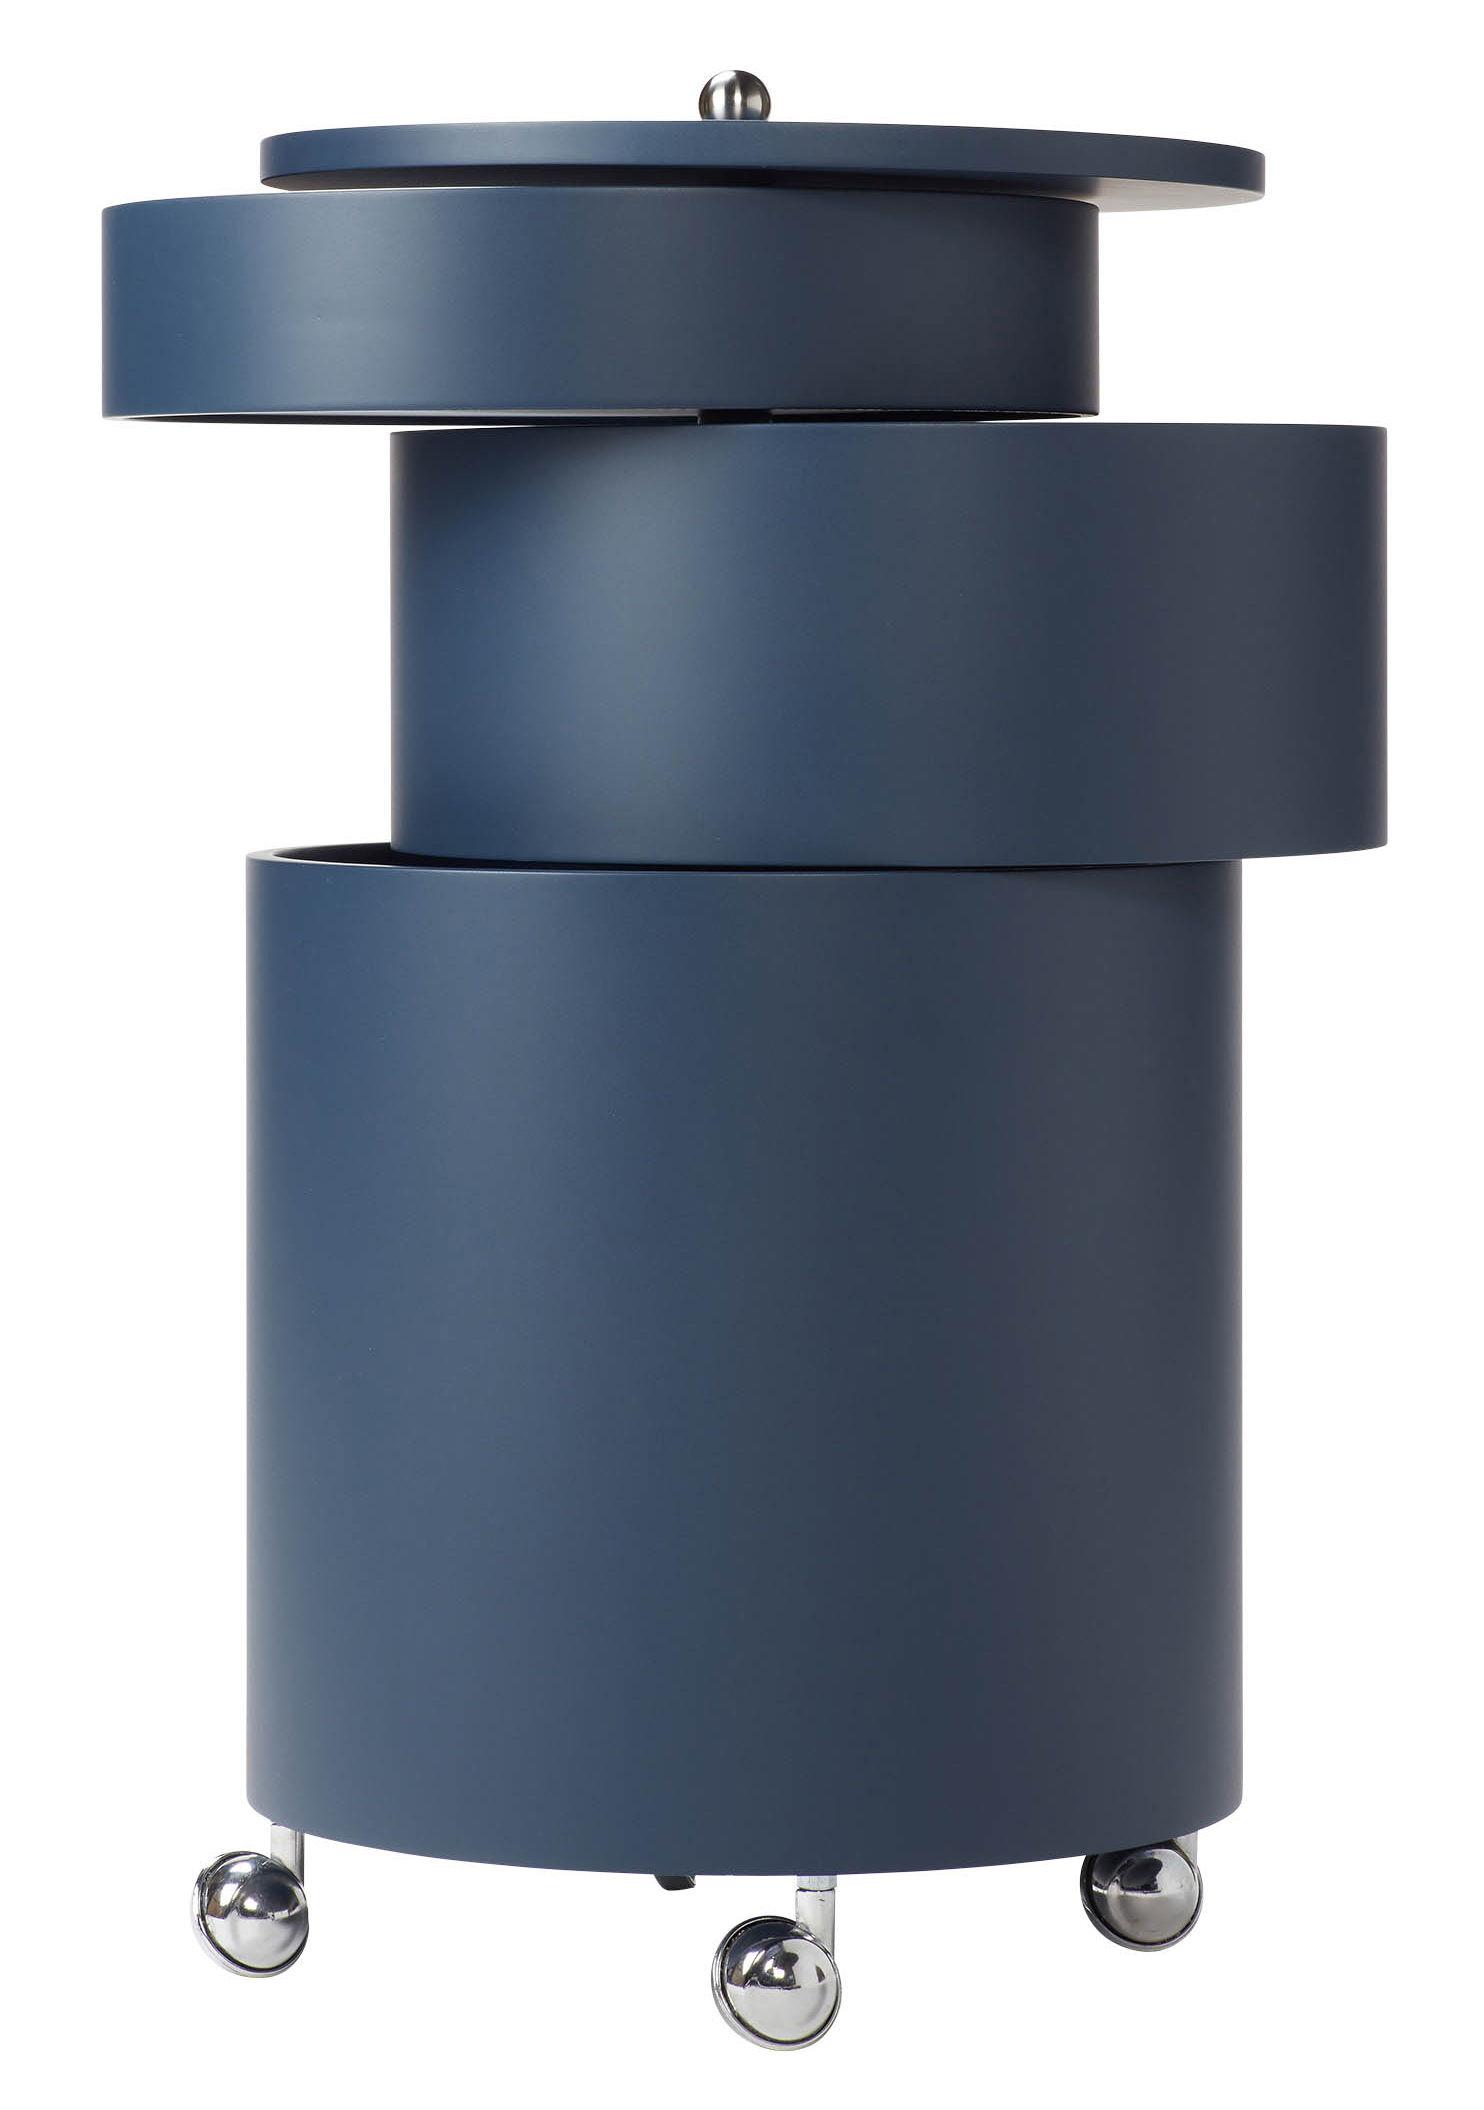 Furniture - Shelves & Storage Furniture - Barboy Dresser - Panton 1963 by Verpan - Blue - Wood